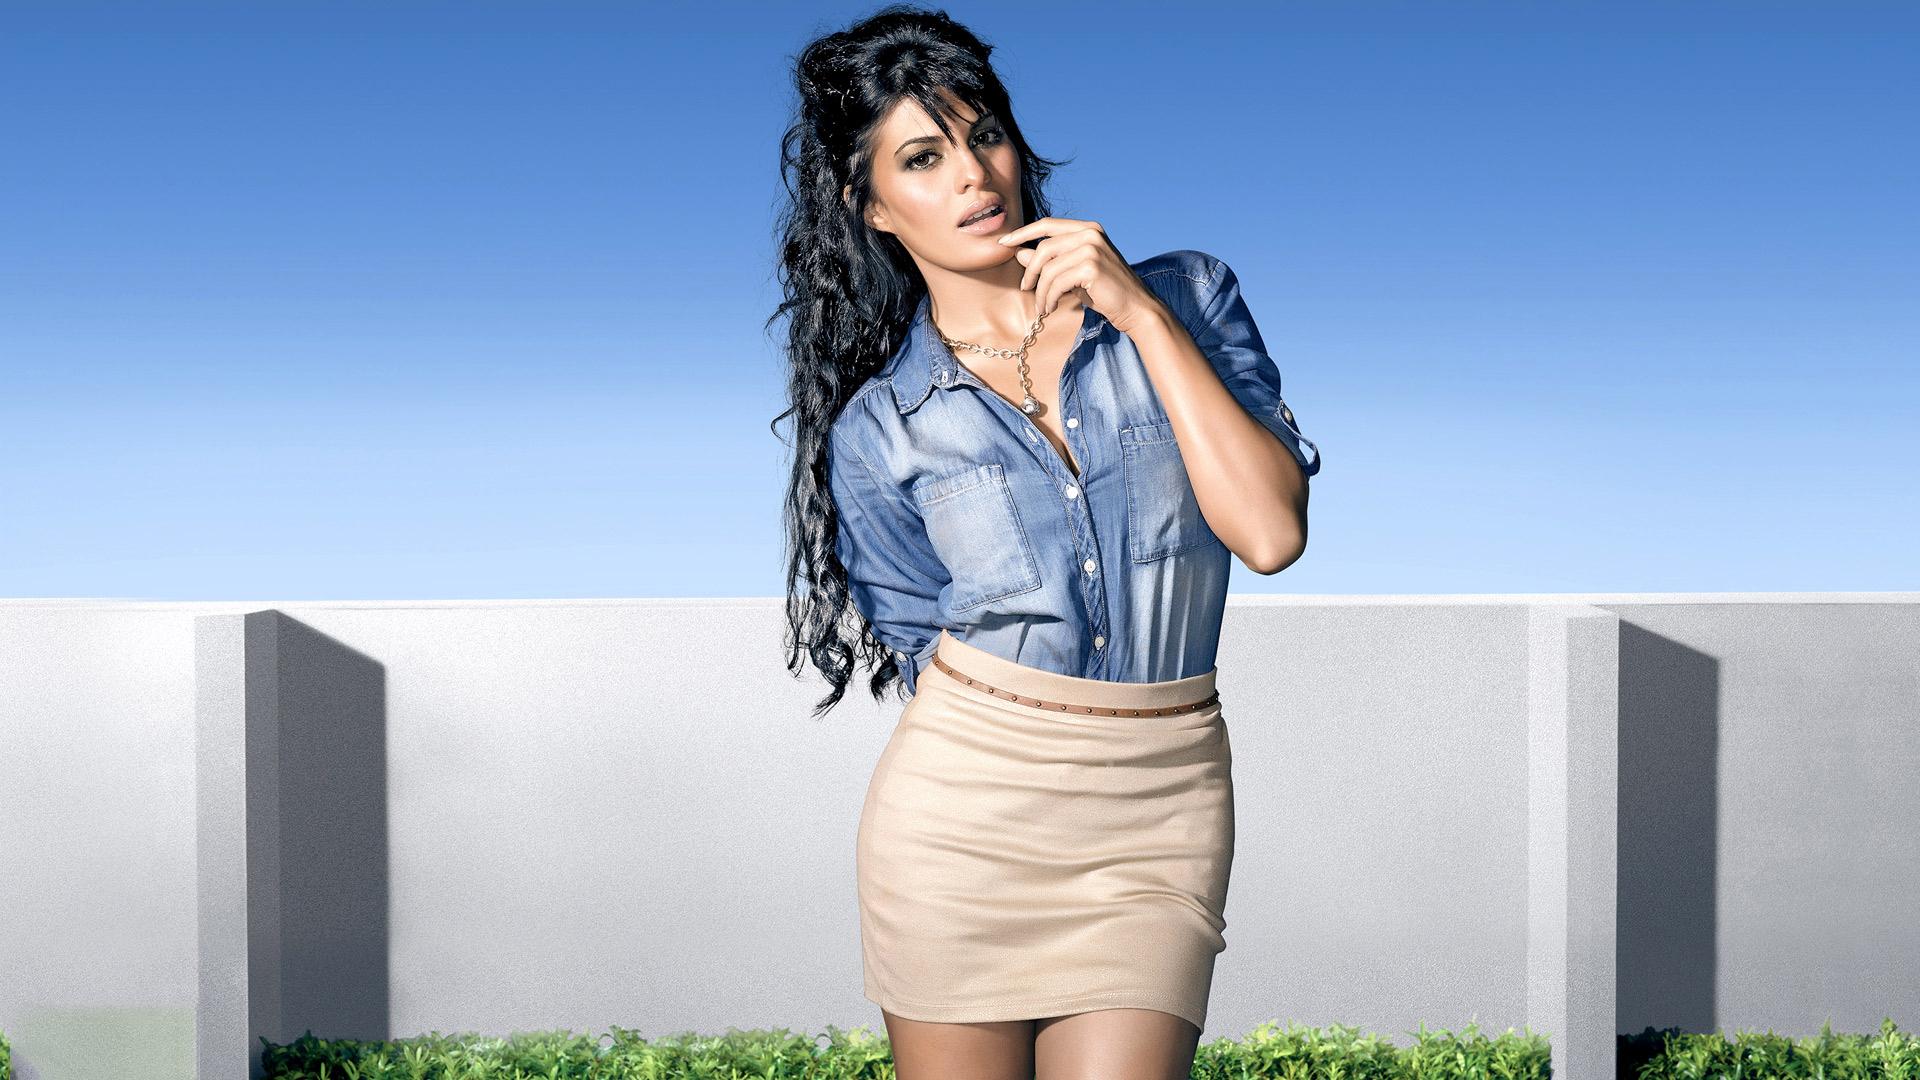 Jacqueline fernandez hot photoshoot popopics com